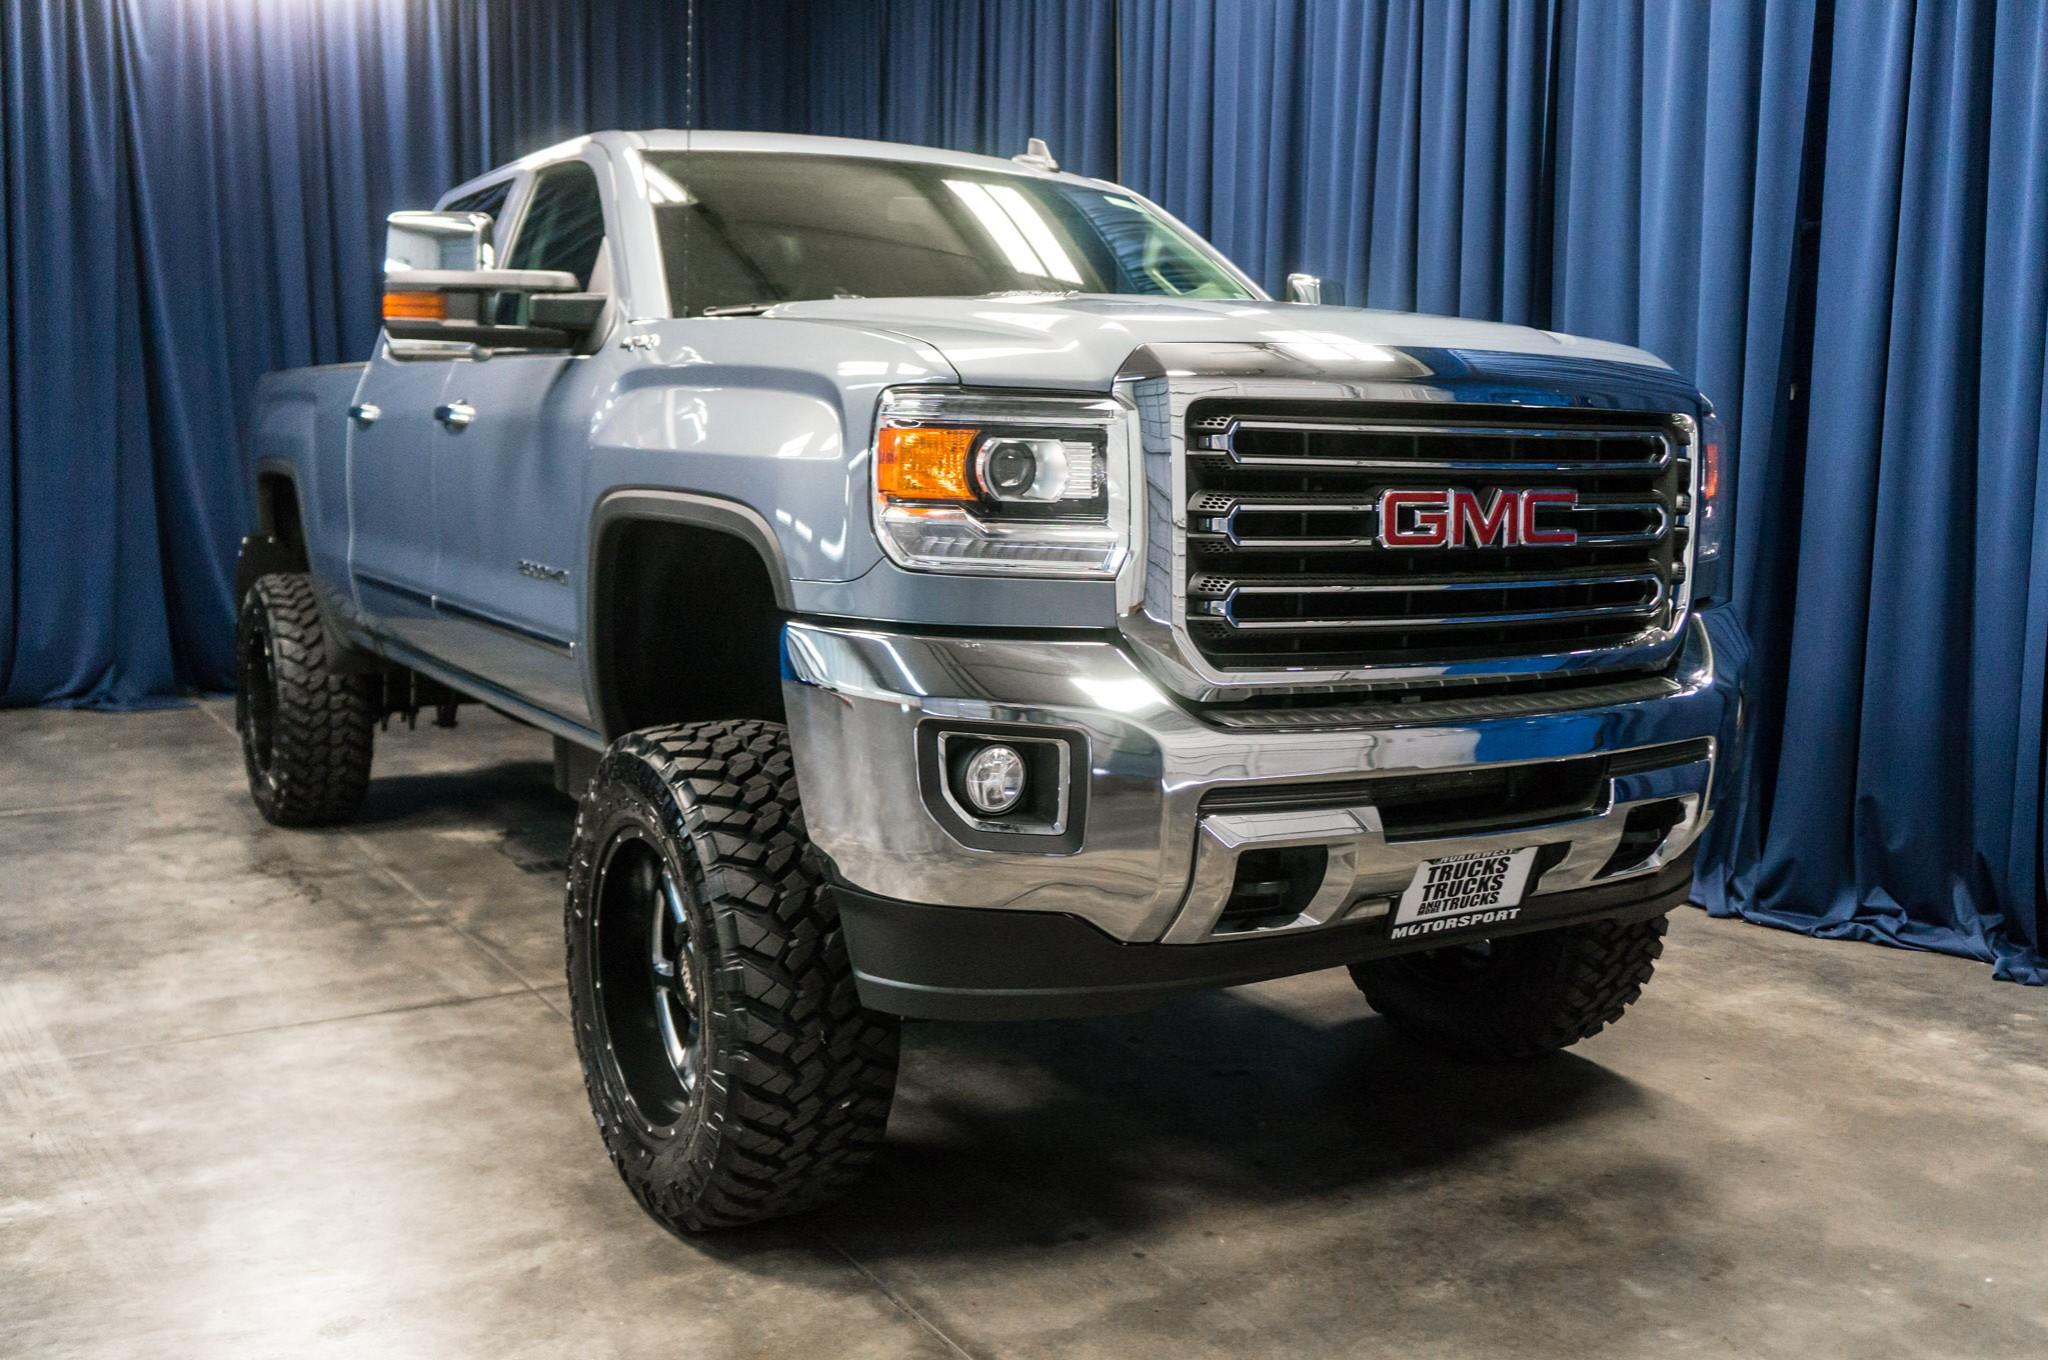 Used Lifted 2016 GMC Sierra 2500 HD SLT 4x4 Diesel Truck